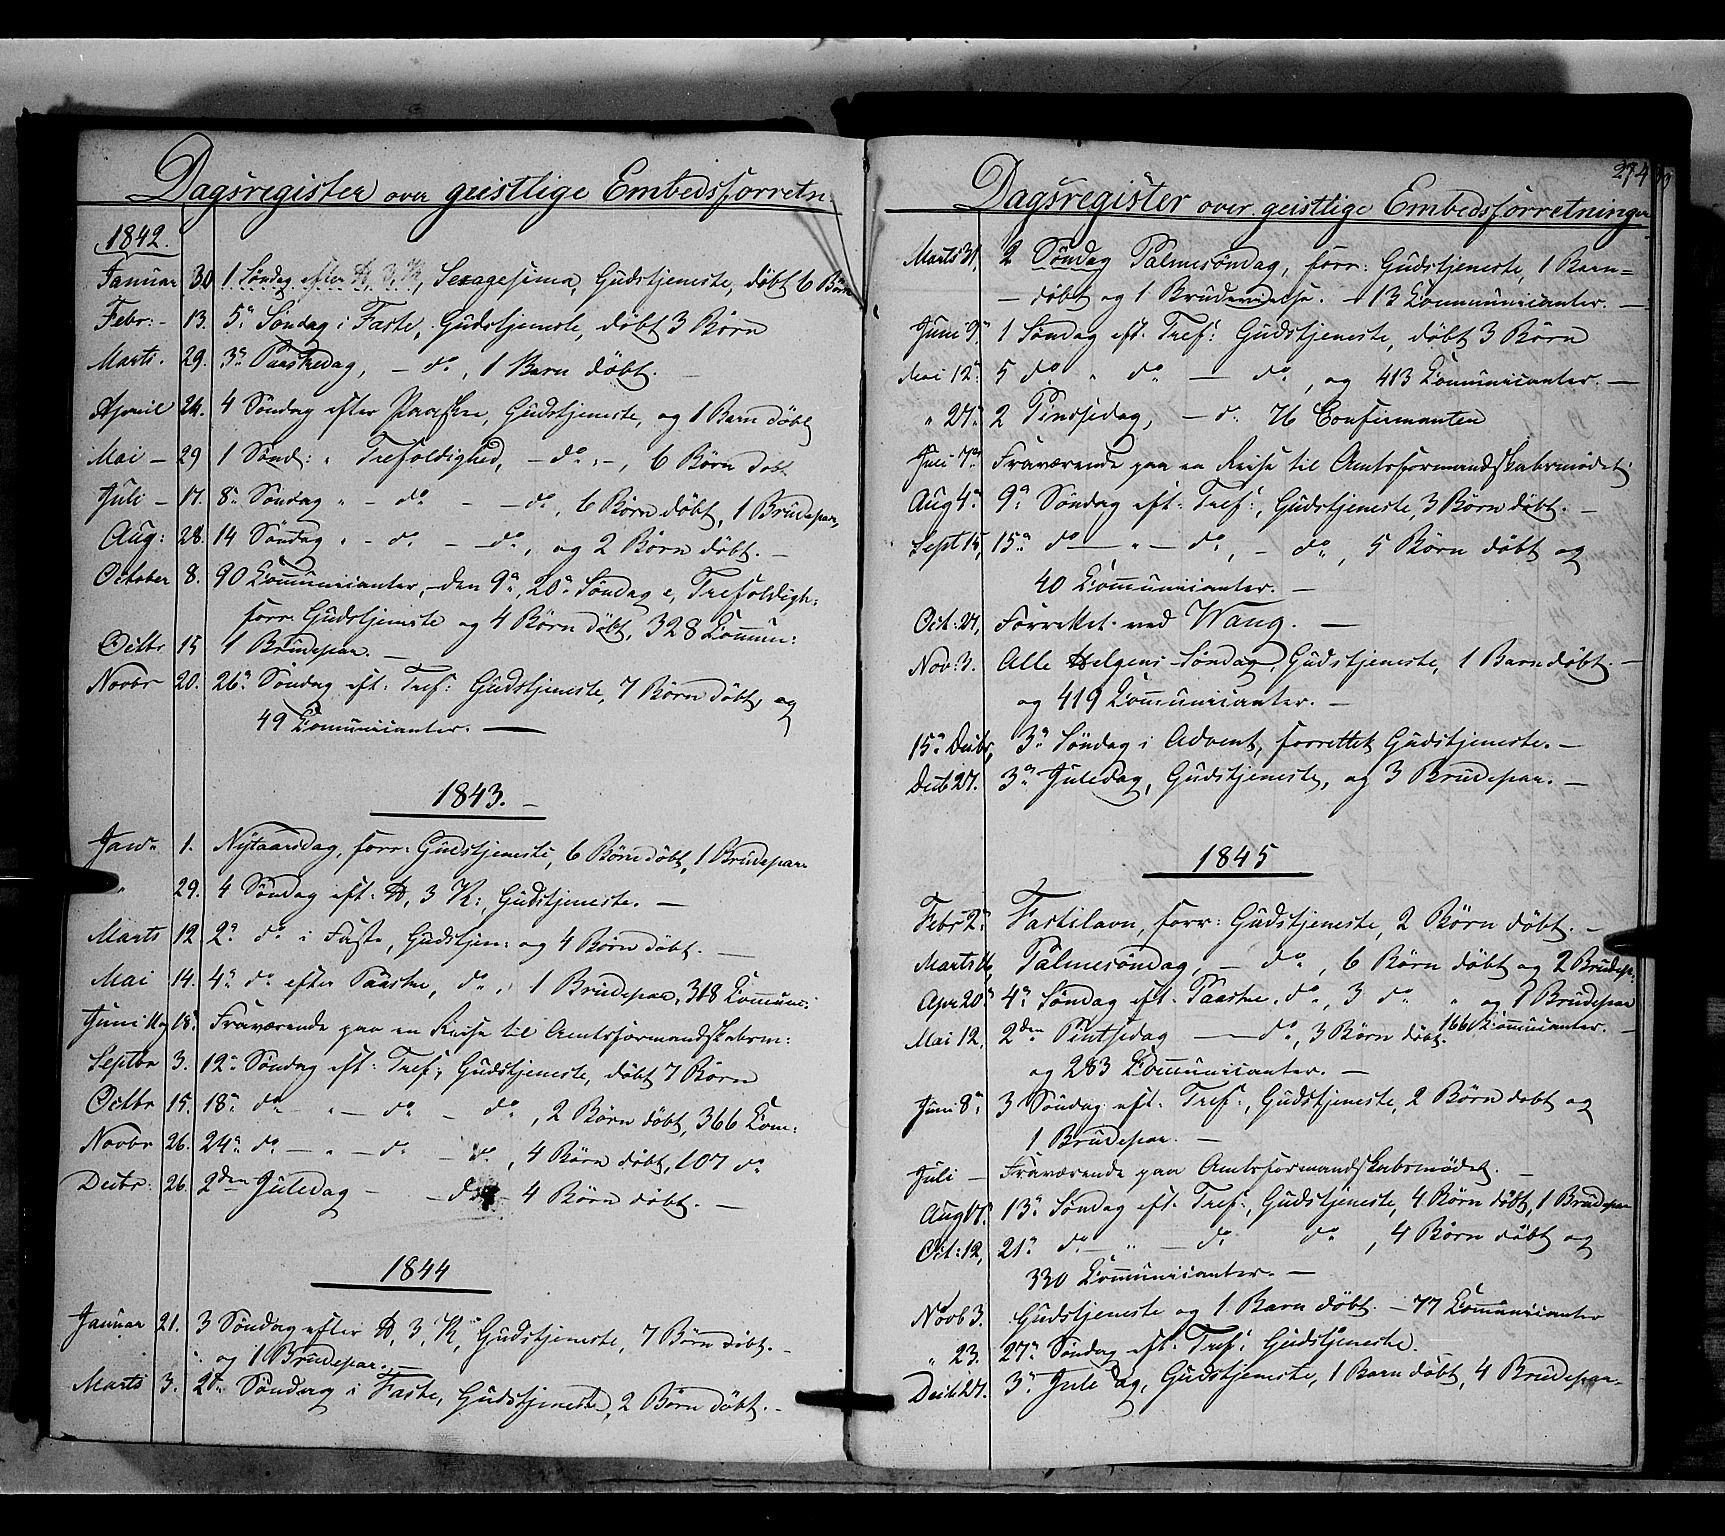 SAH, Nord-Aurdal prestekontor, Ministerialbok nr. 6, 1842-1863, s. 274